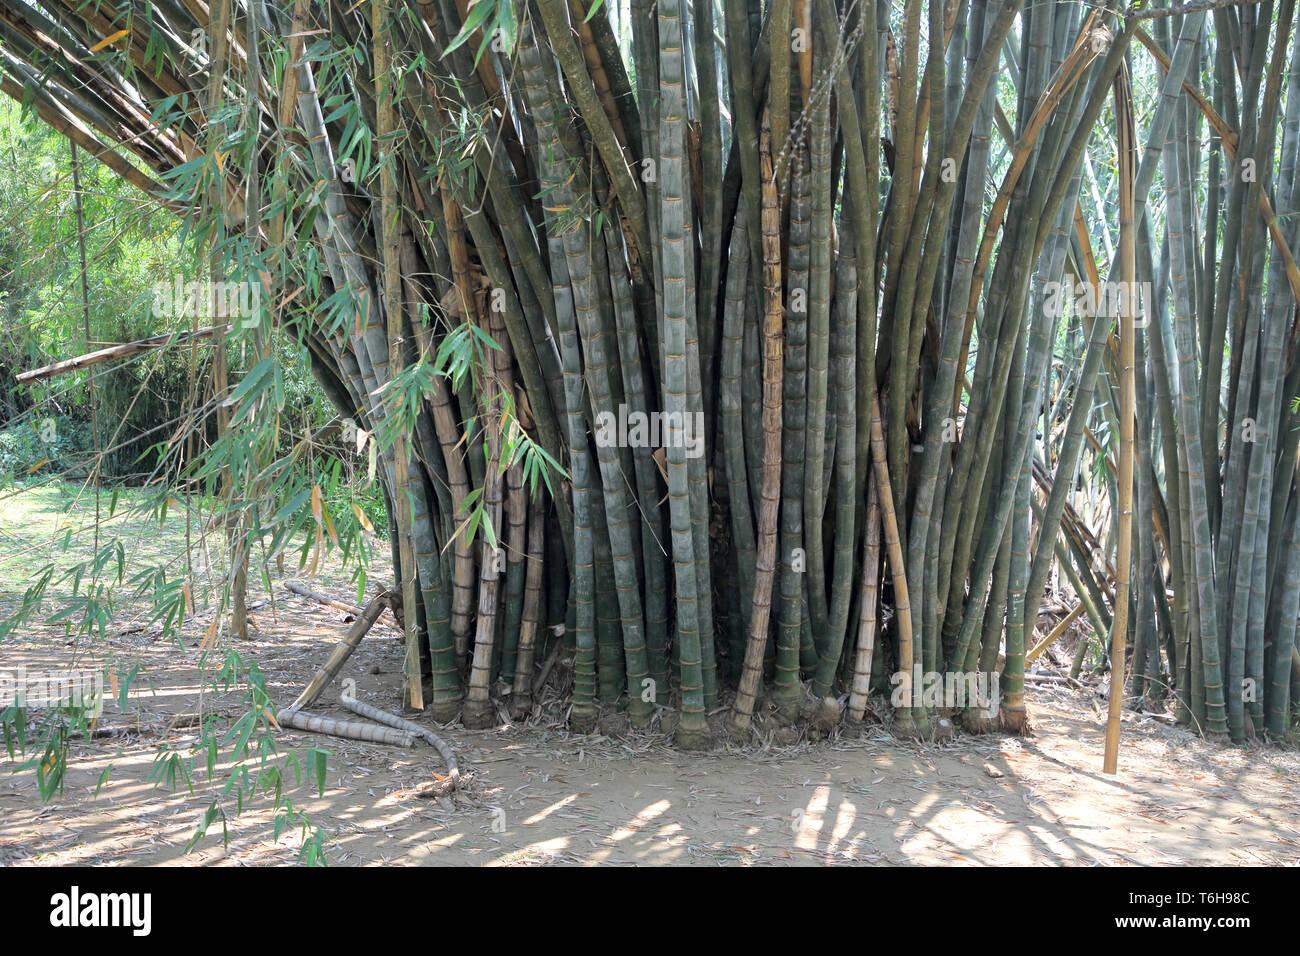 bamboo in the royal botanic gardens in kandy sri lanka - Stock Image